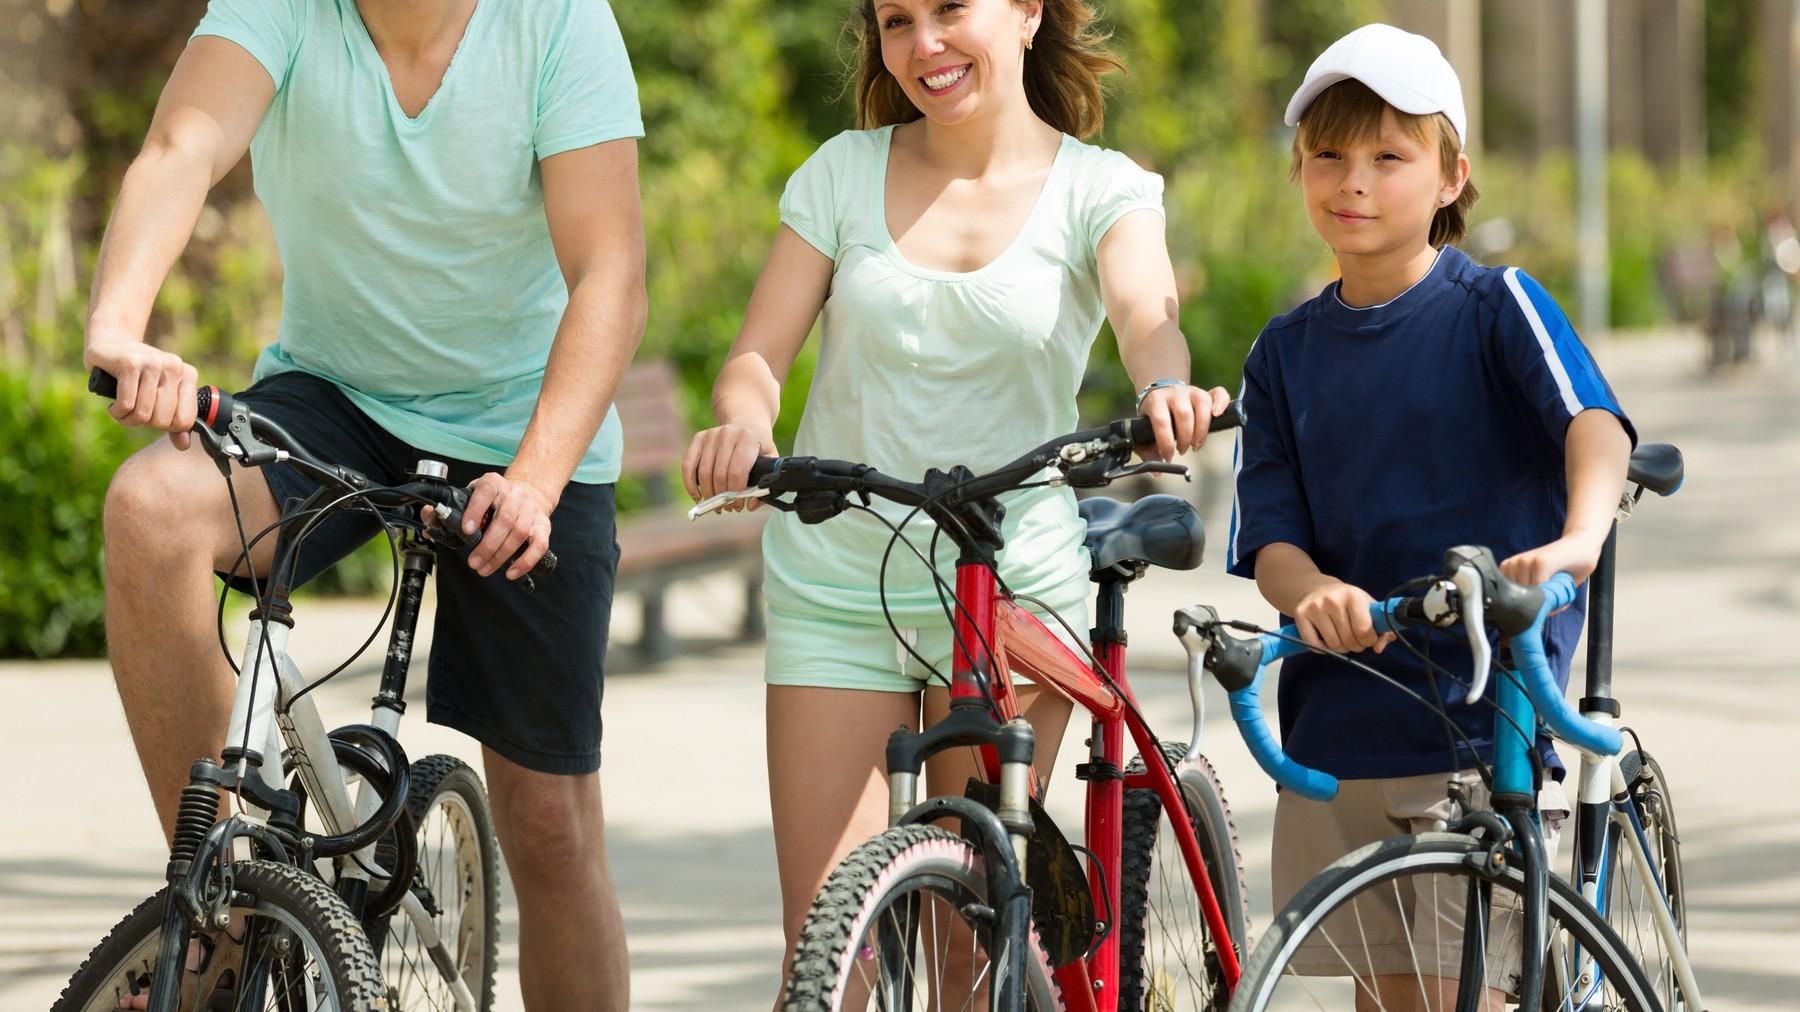 Familia andando en bicicleta